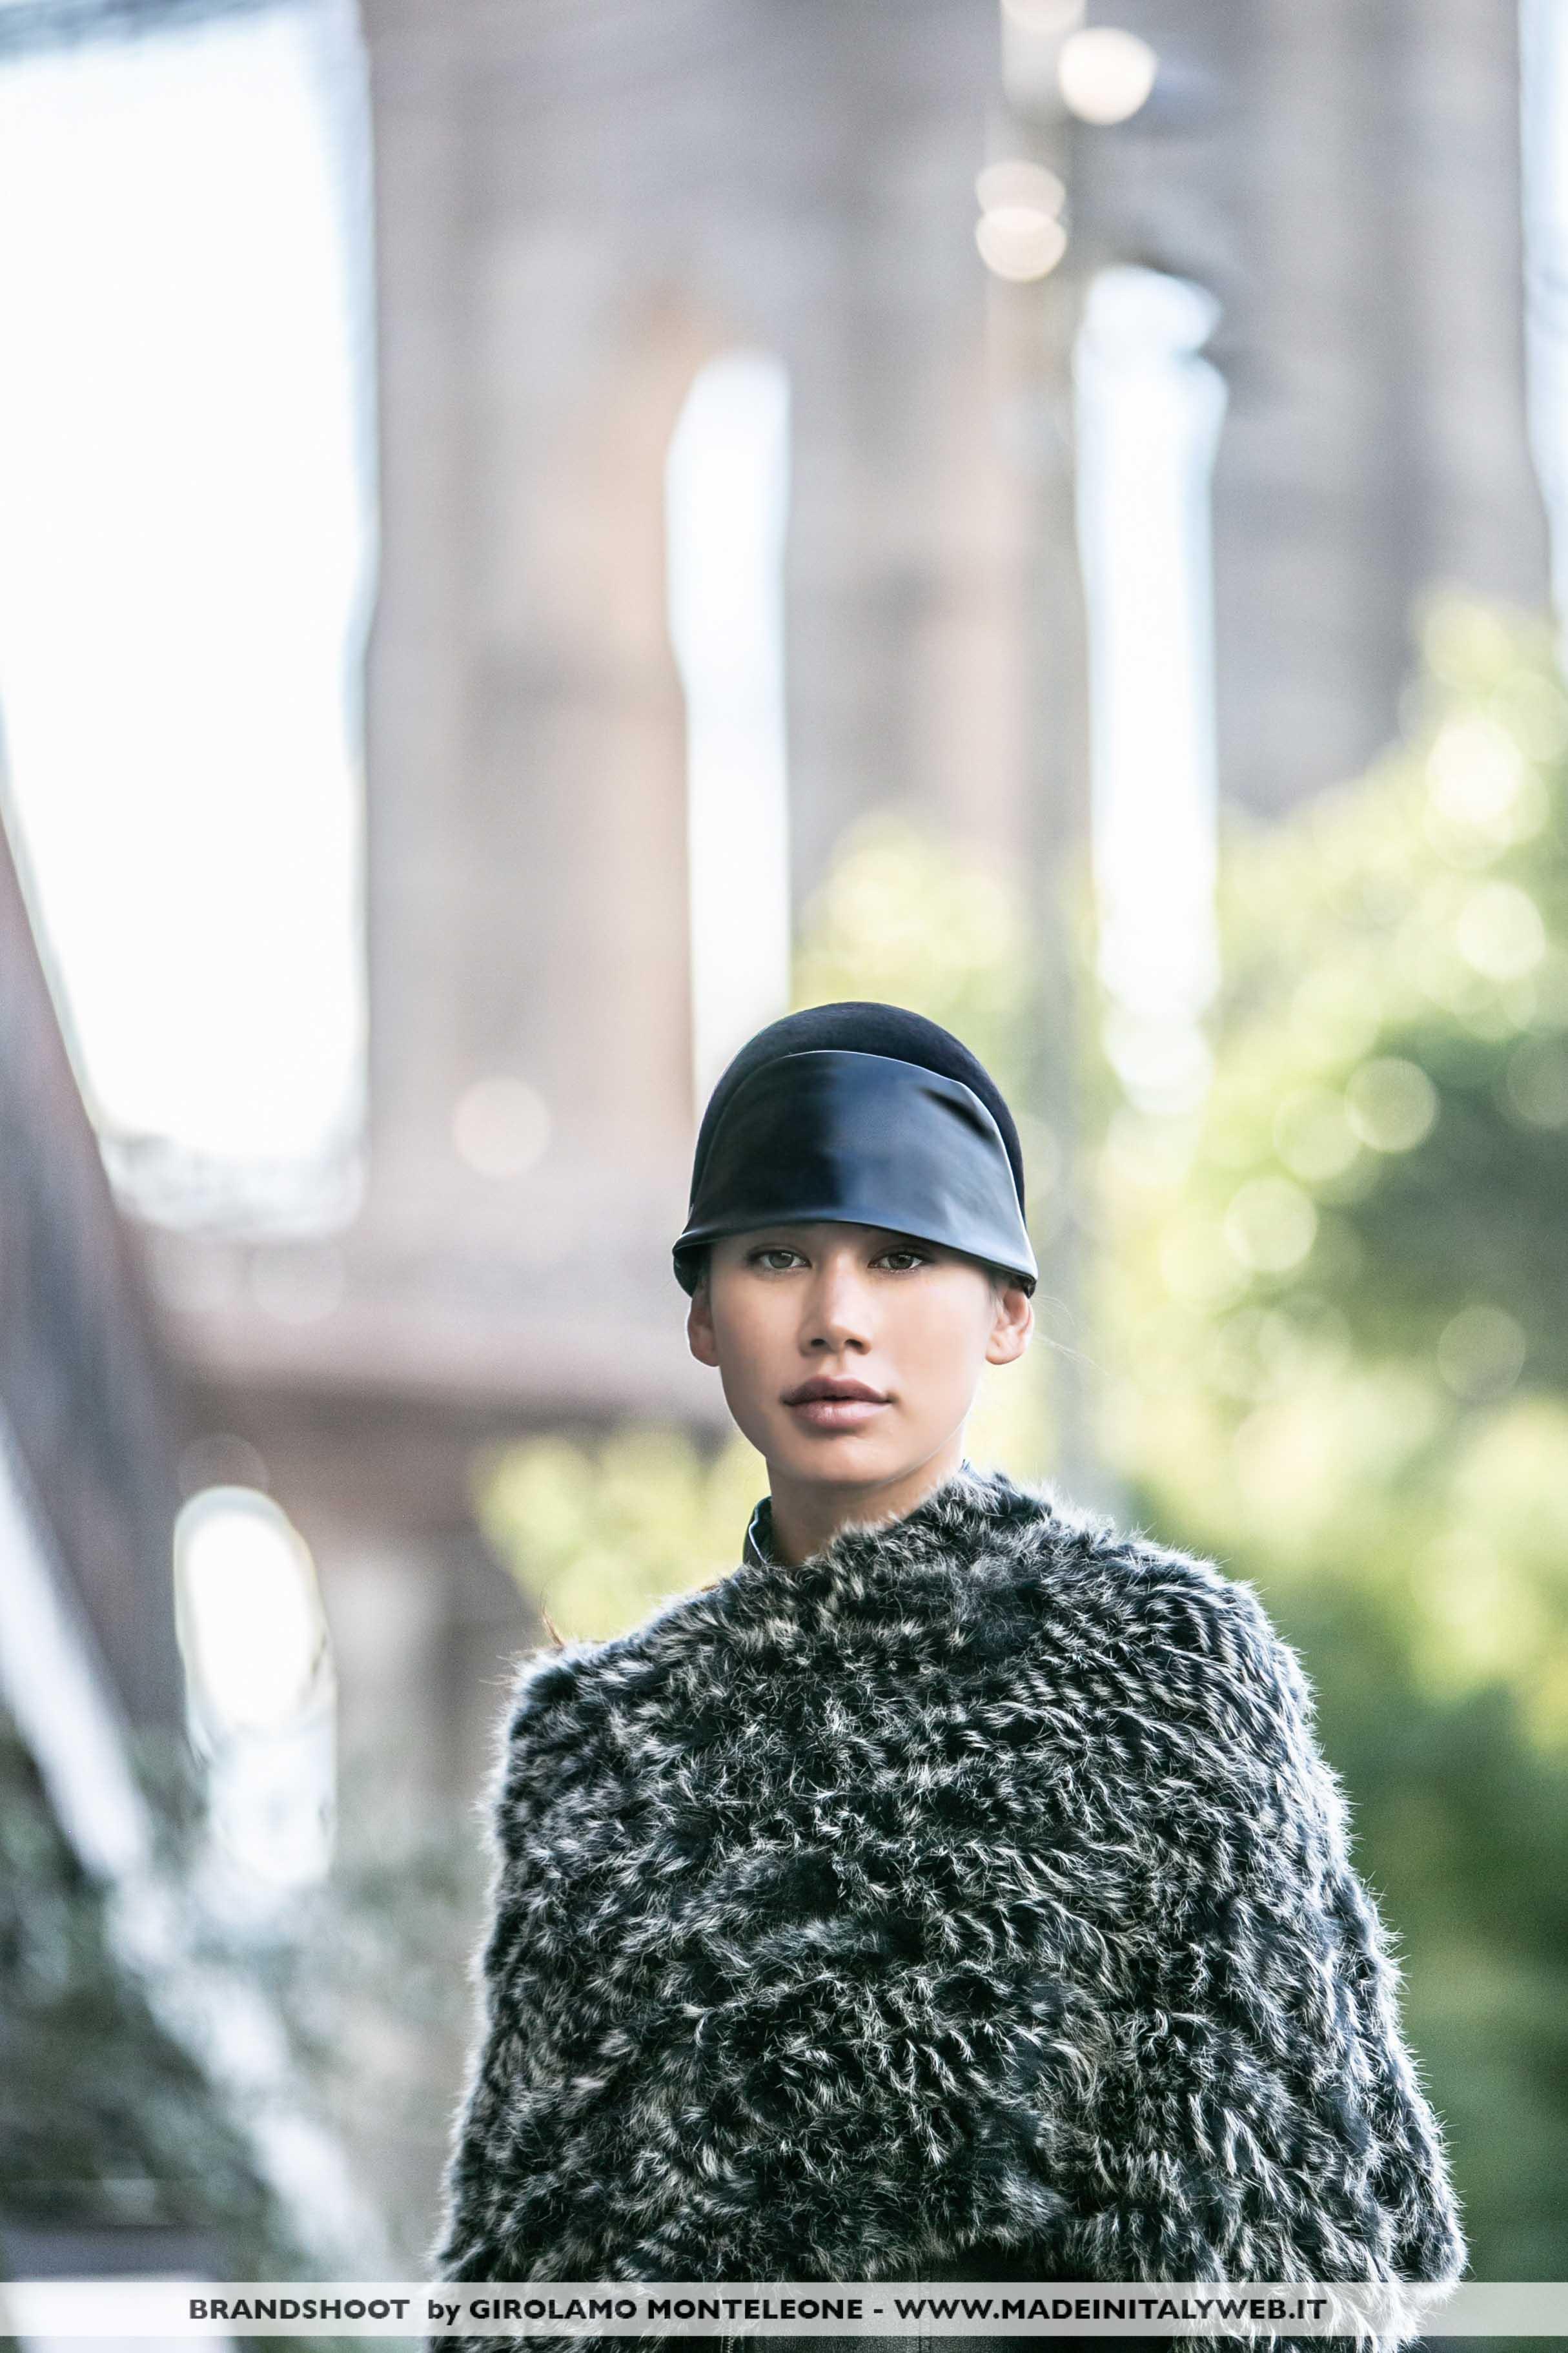 fashion street photographer NEWYORK ROMA CADOCAP NEW_YORK_GIROLAMO_MONTELEONE_2018ottobre032306061527_IMG_9328